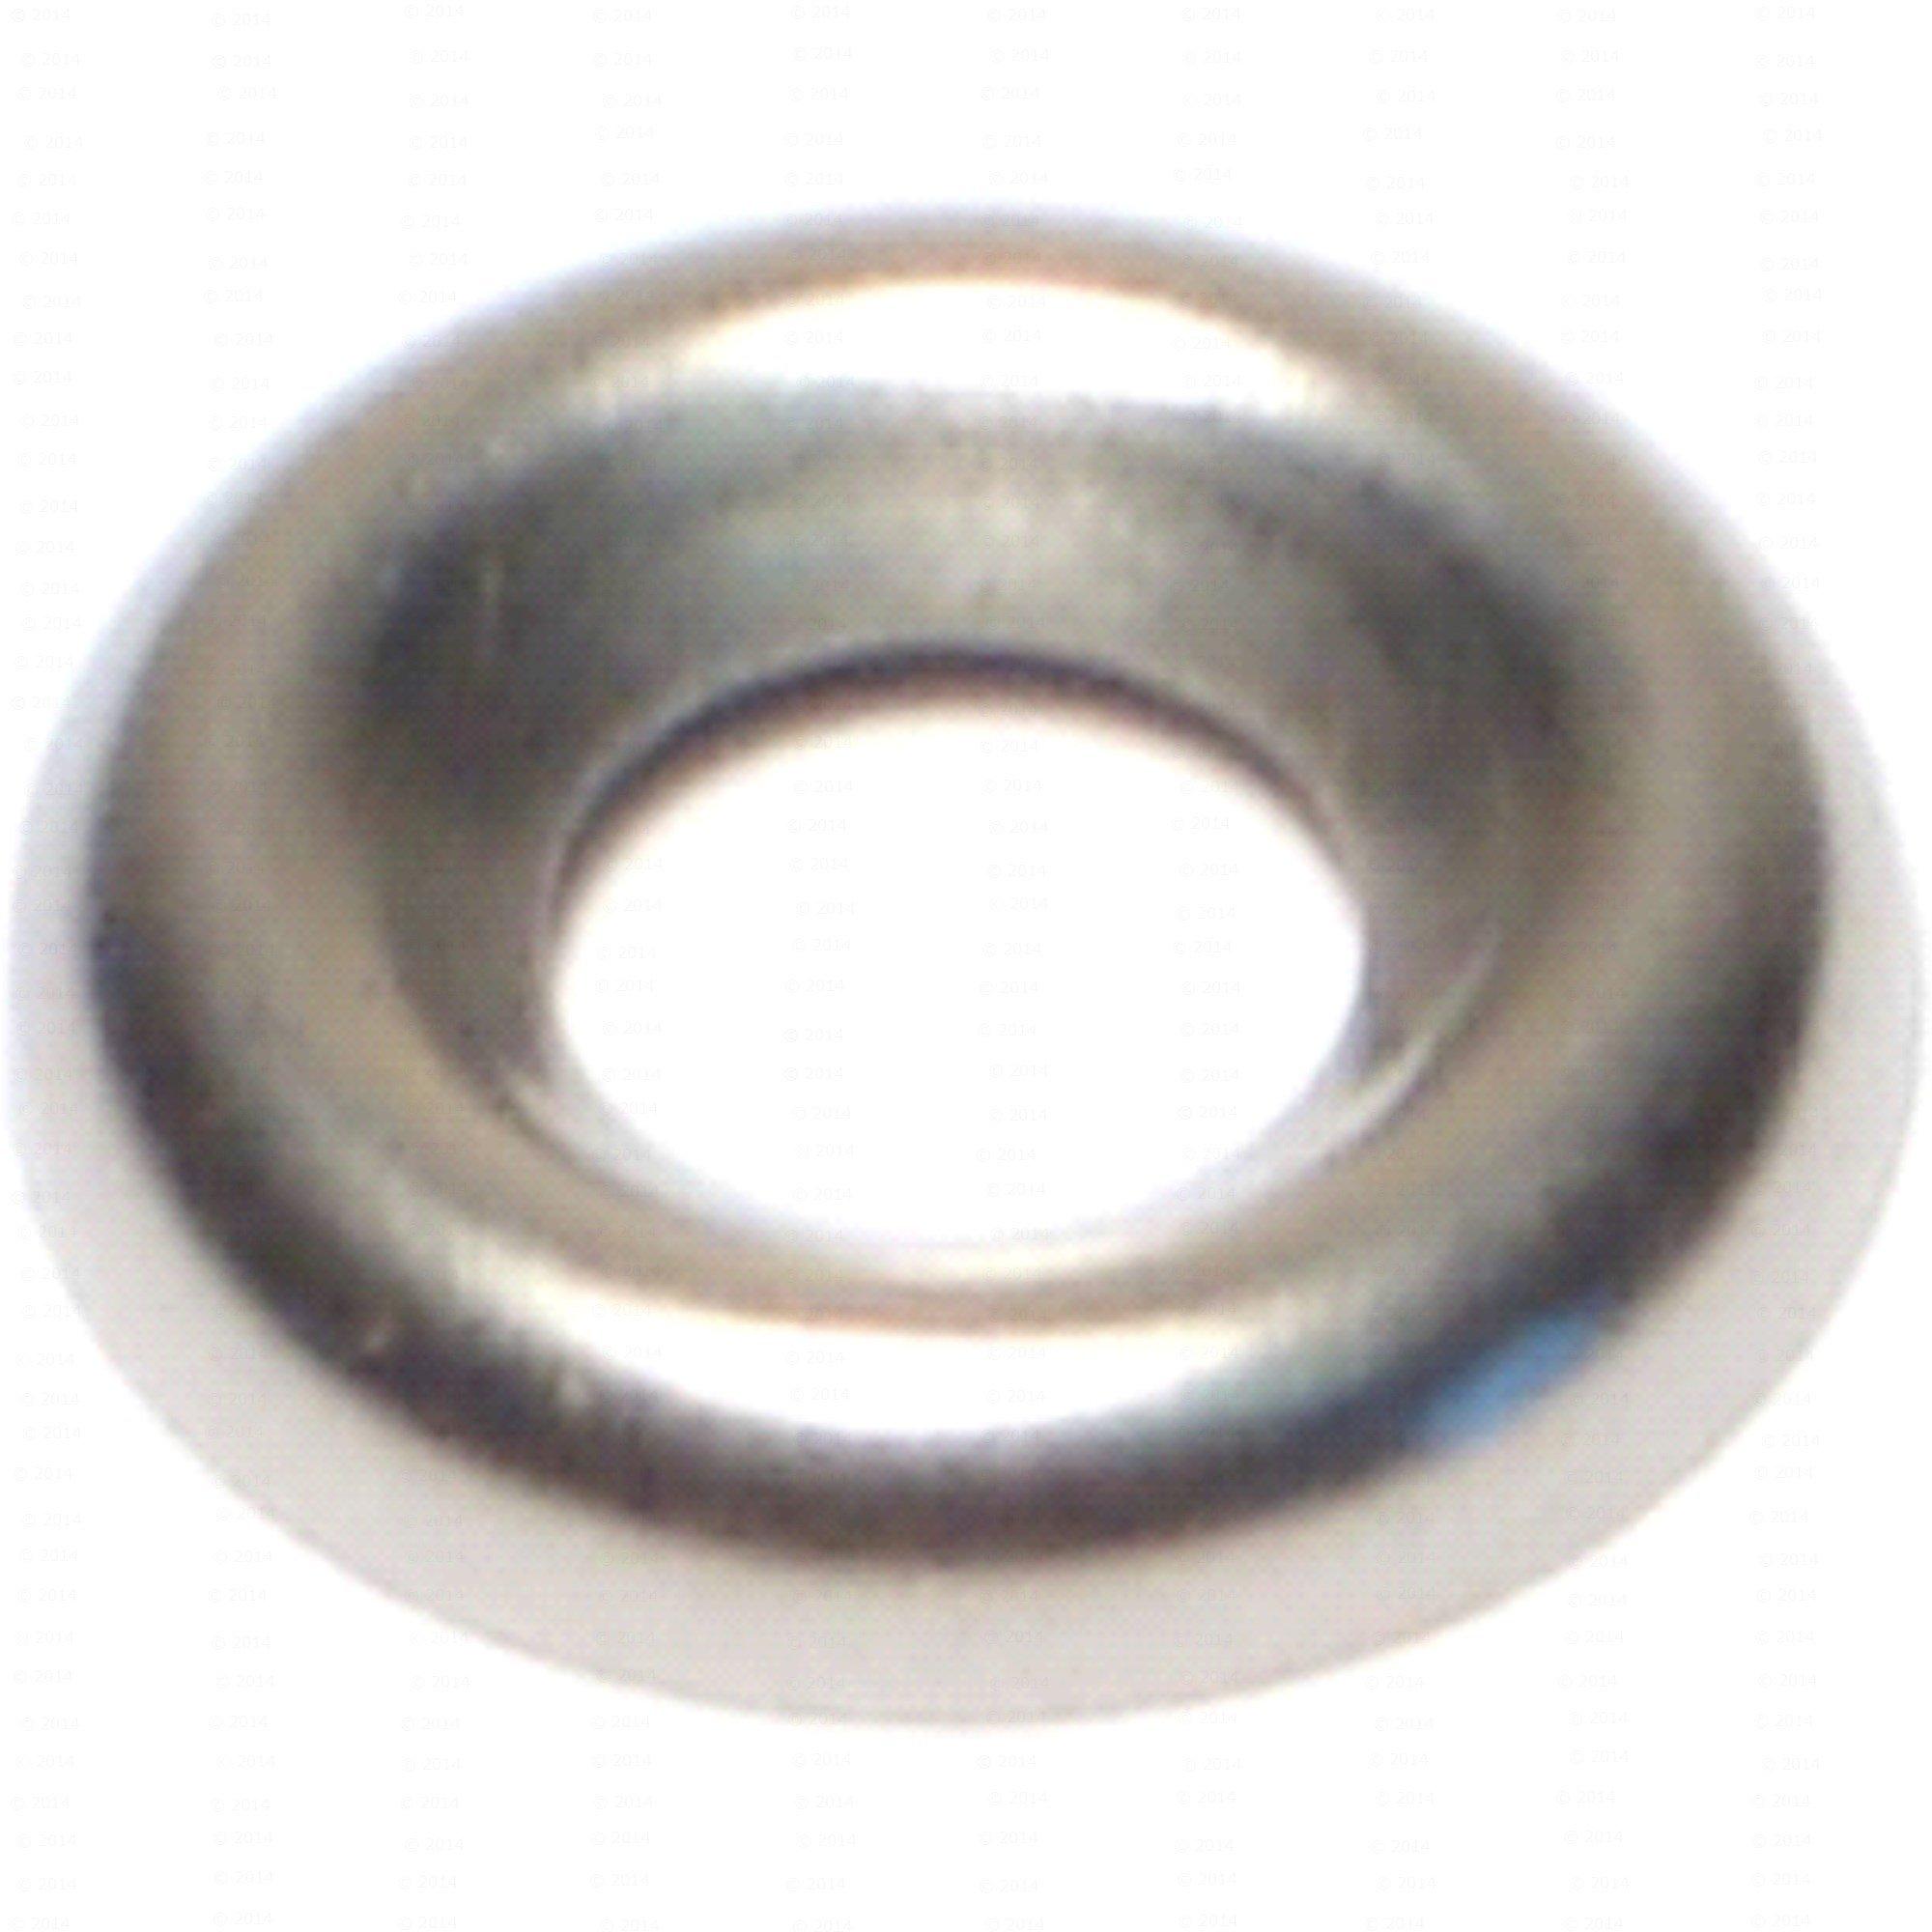 Hard-to-Find Fastener 014973352141 Finishing Washers, 10, Piece-24